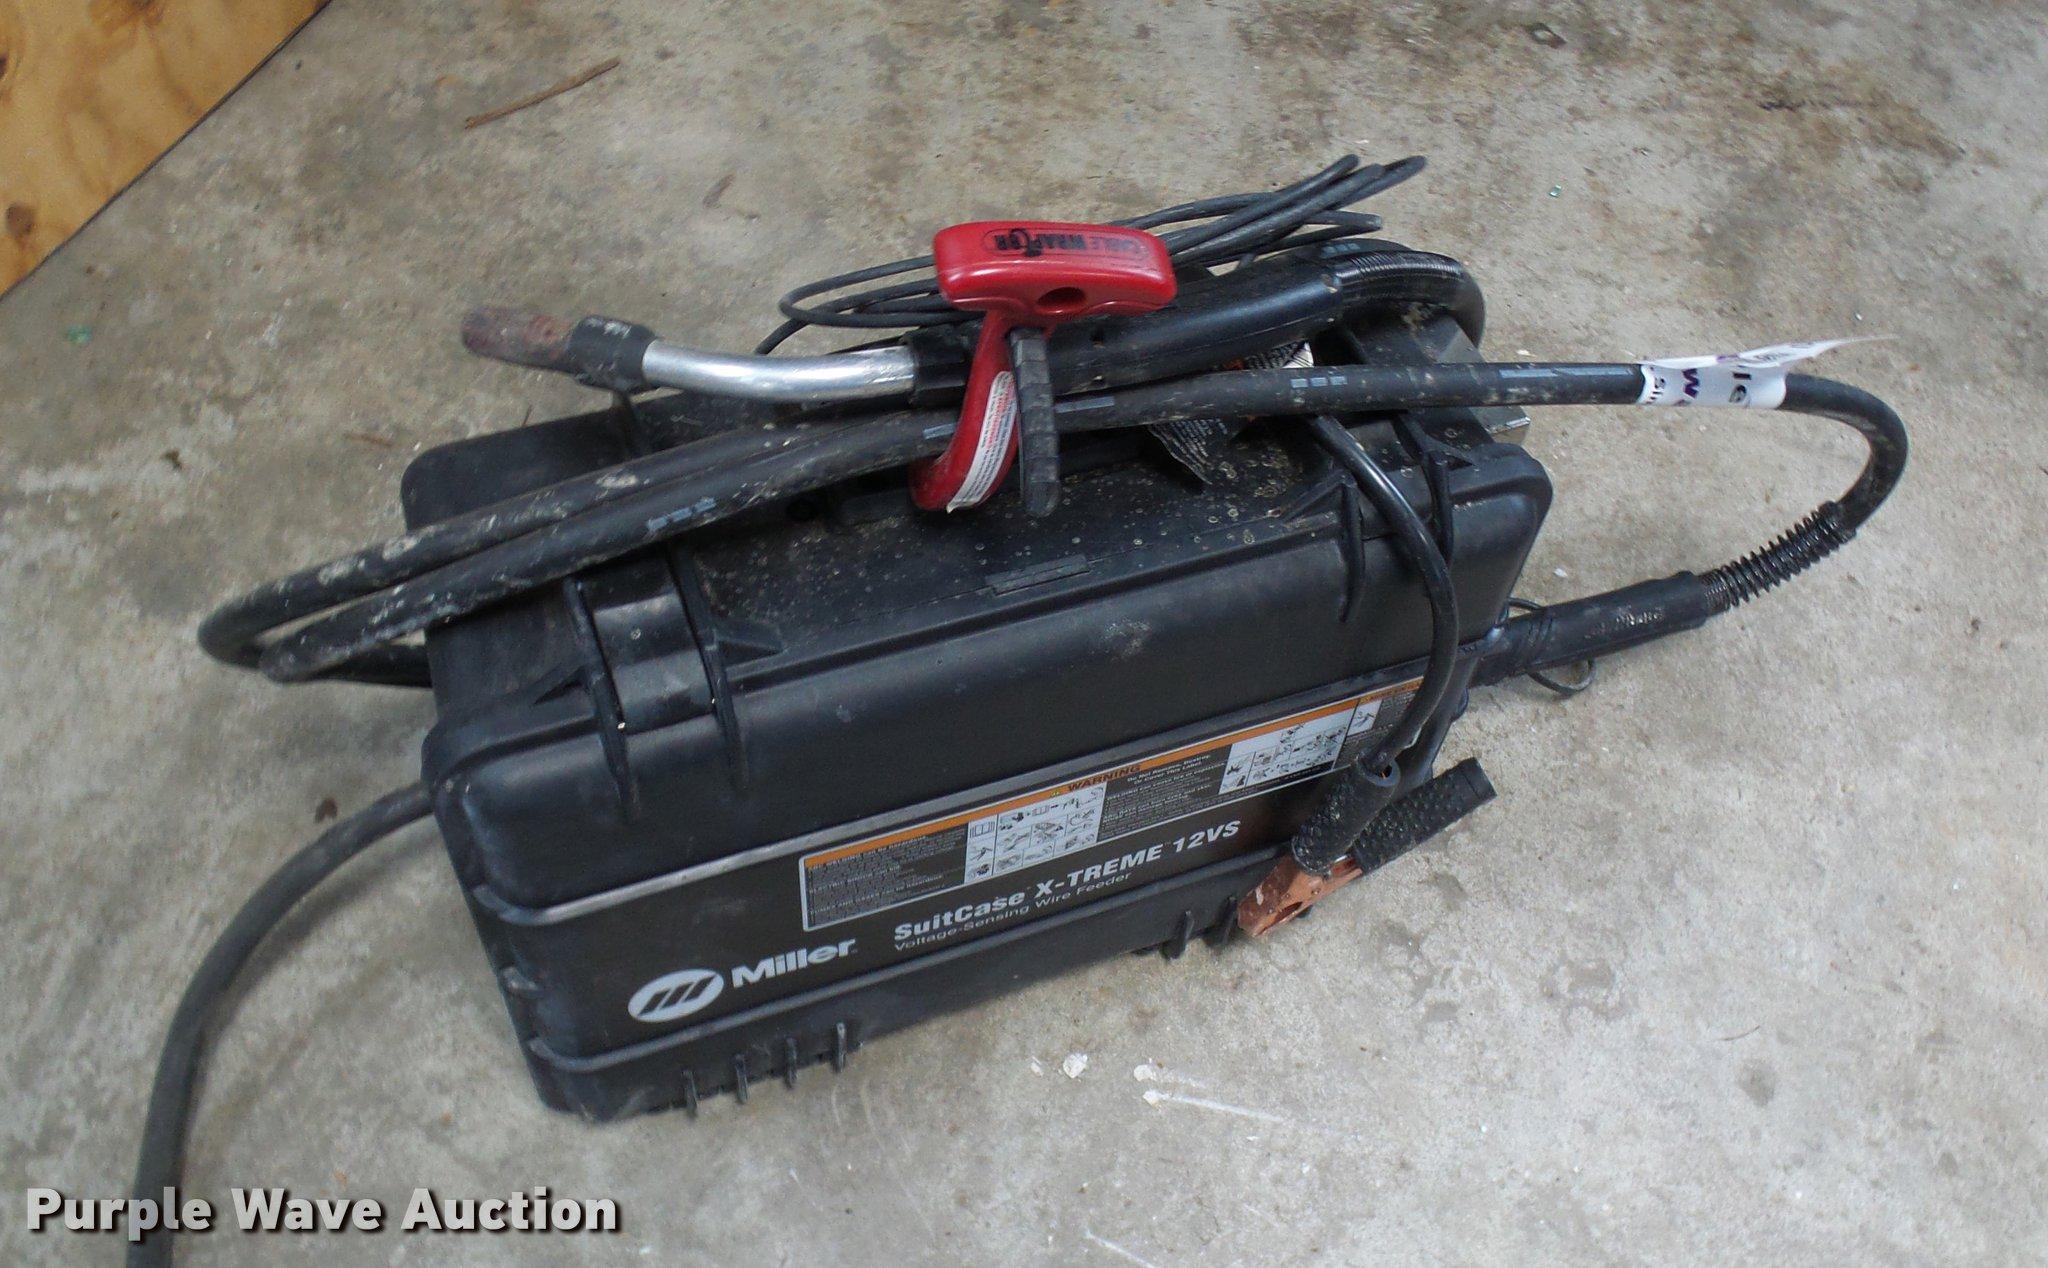 Miller suitcase xtreme 12vs hook up